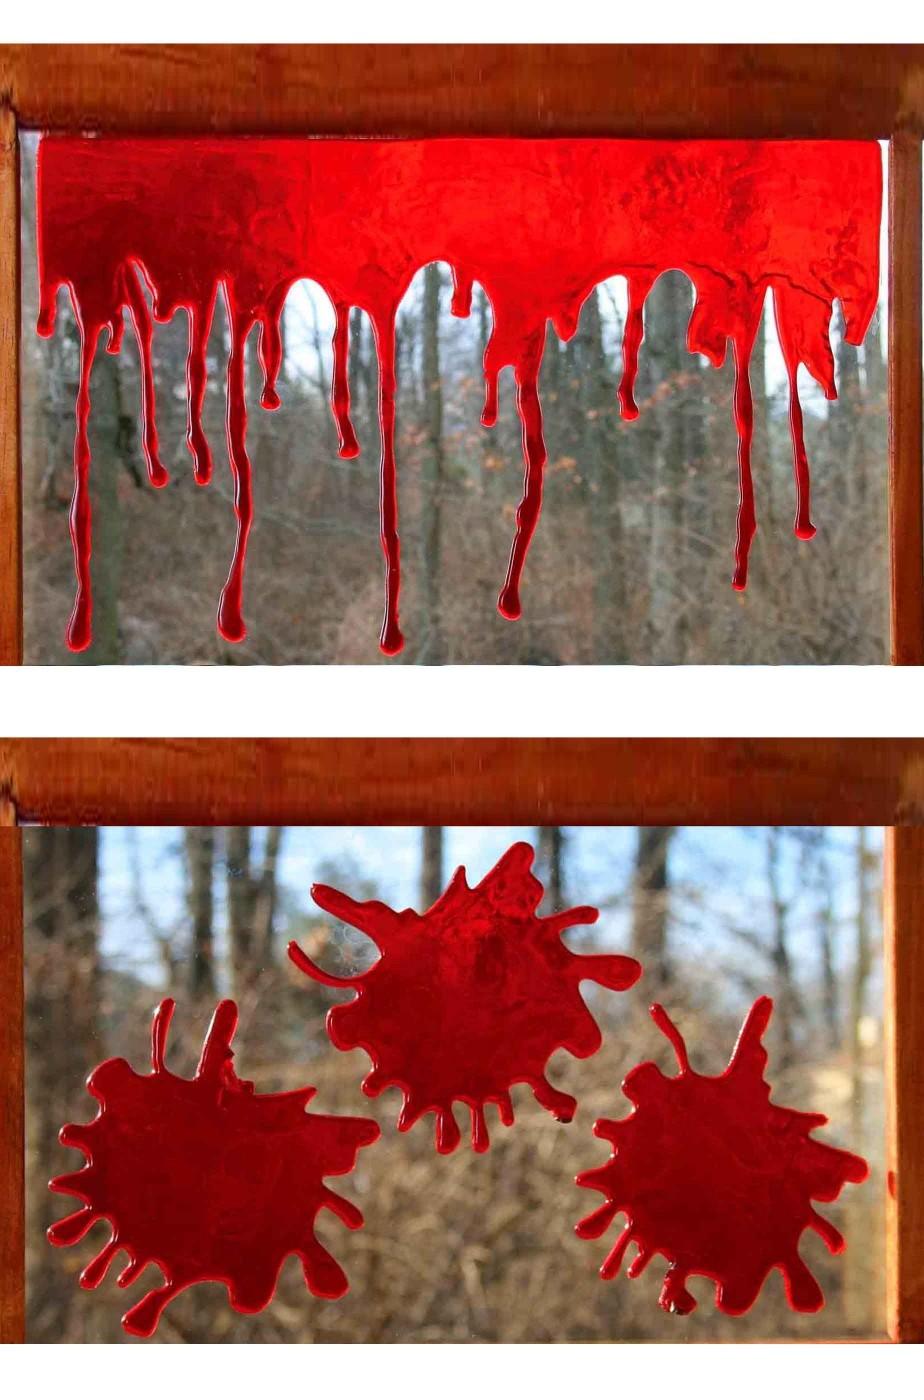 Decorazione Halloween da finestra pacchetto chiazze di sangue gel